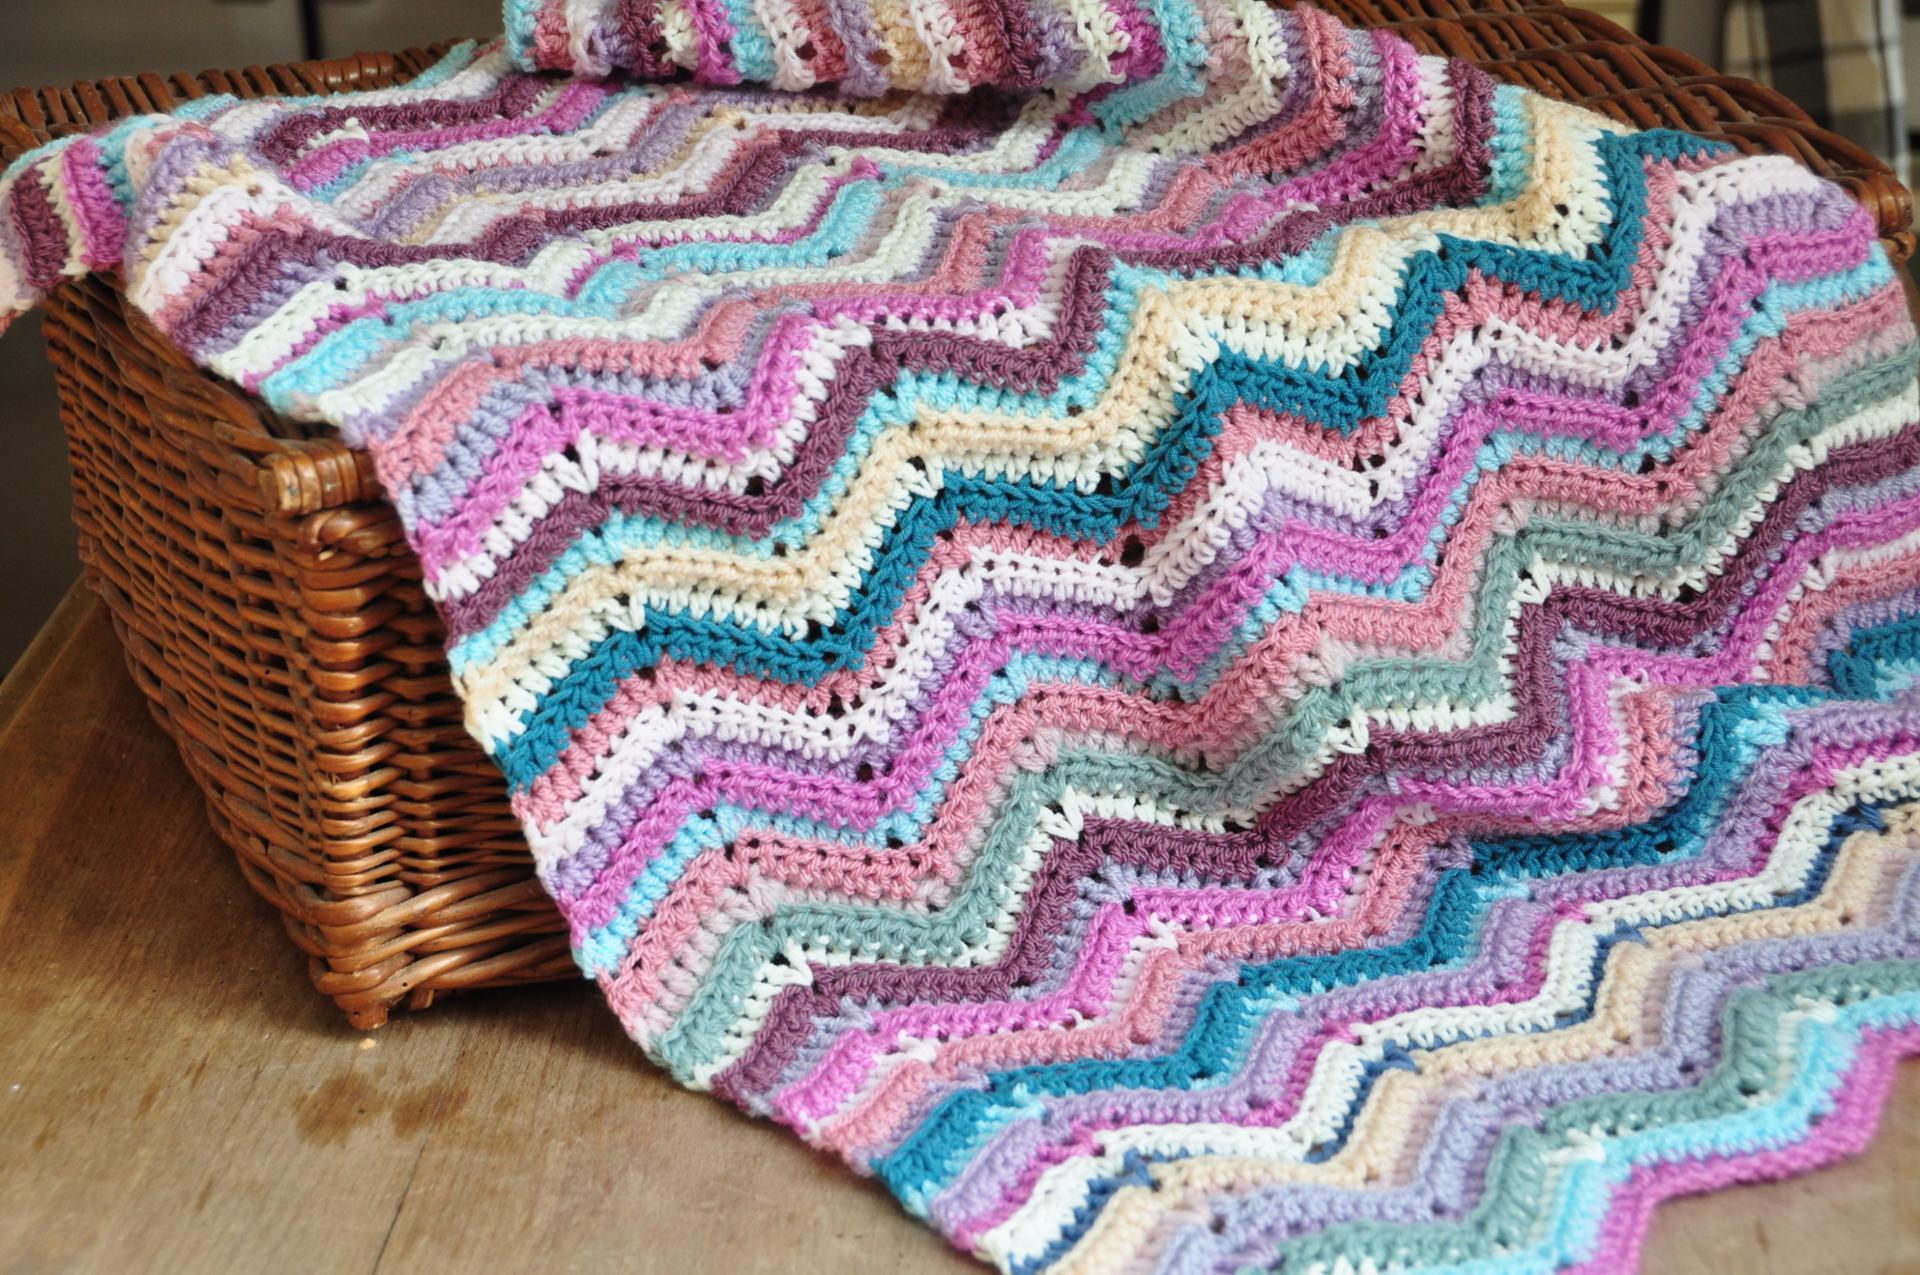 ripple stitch crochet blanket free pattern